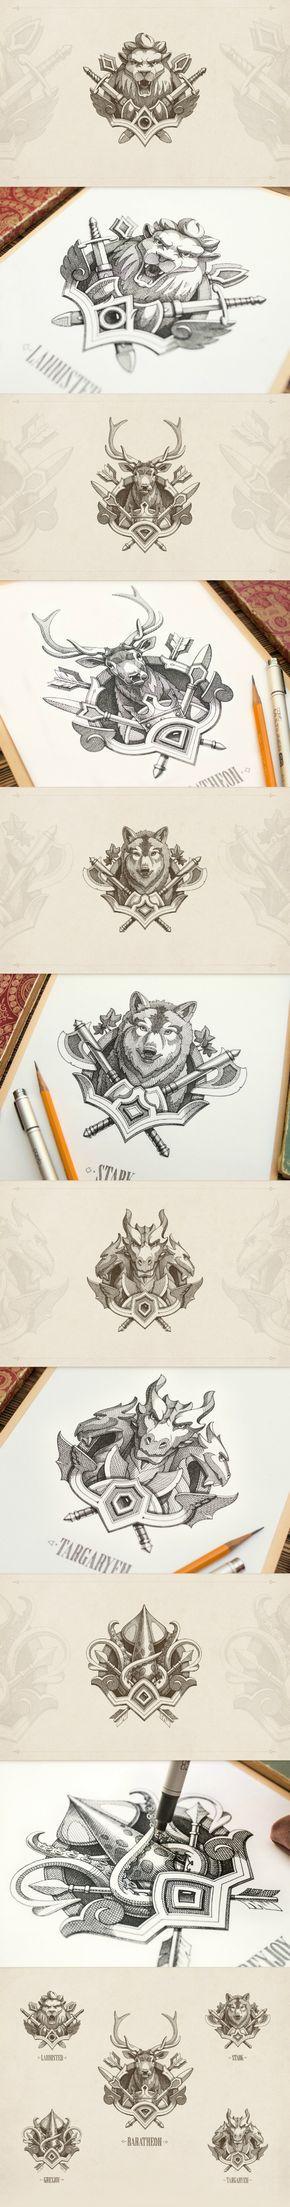 Game of Thrones emblems by NestStrix Studio